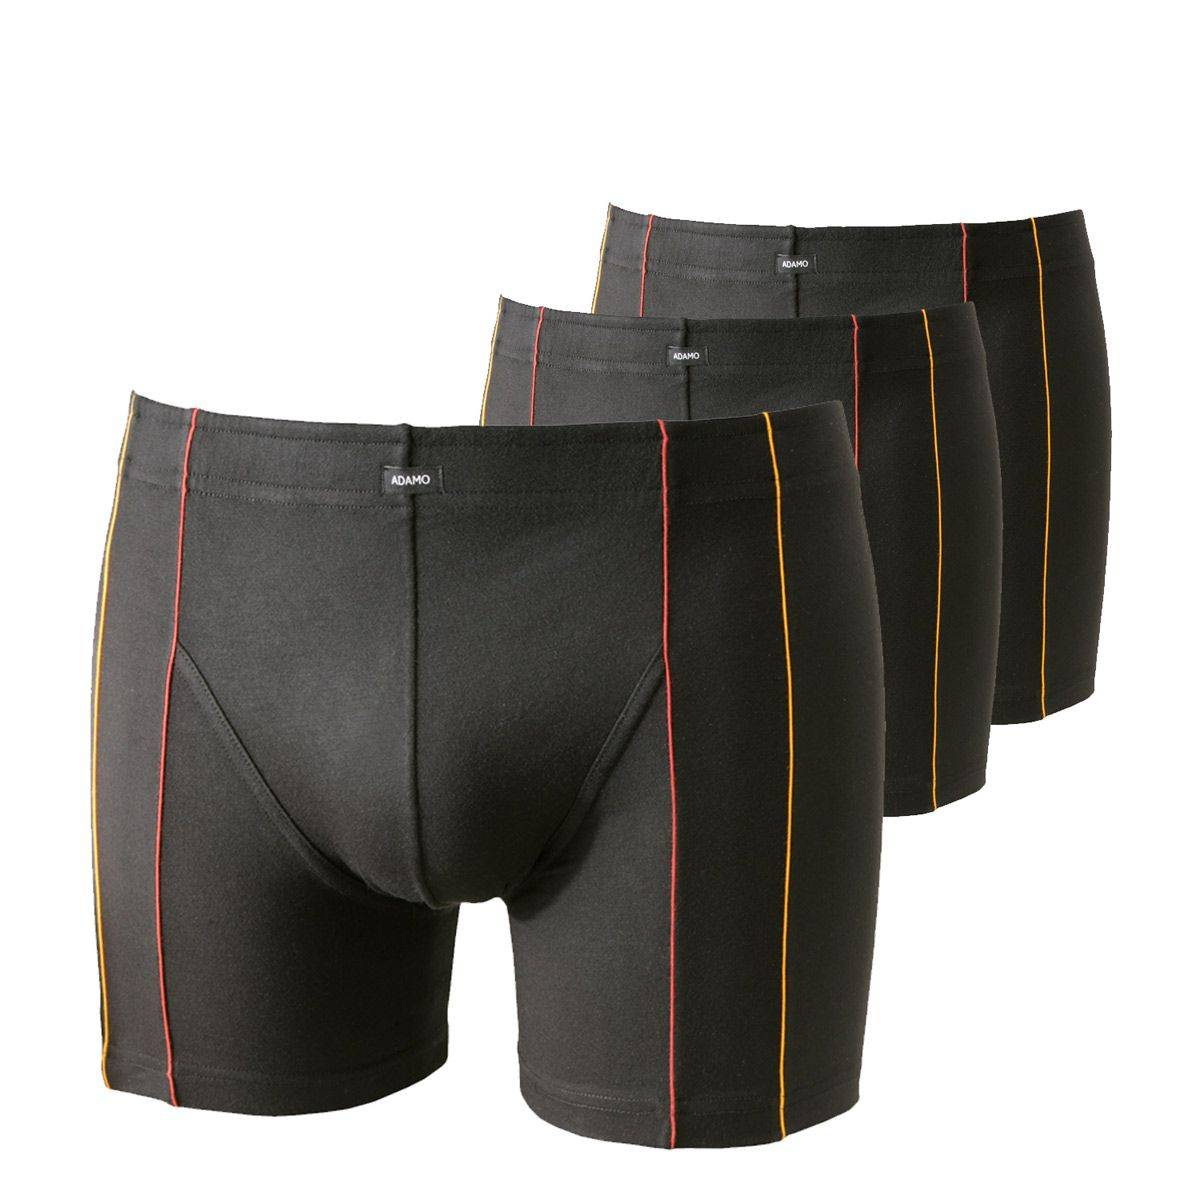 Adamo Lot de 3 boxers en micromodal stretch Adamo grande taille noirs;